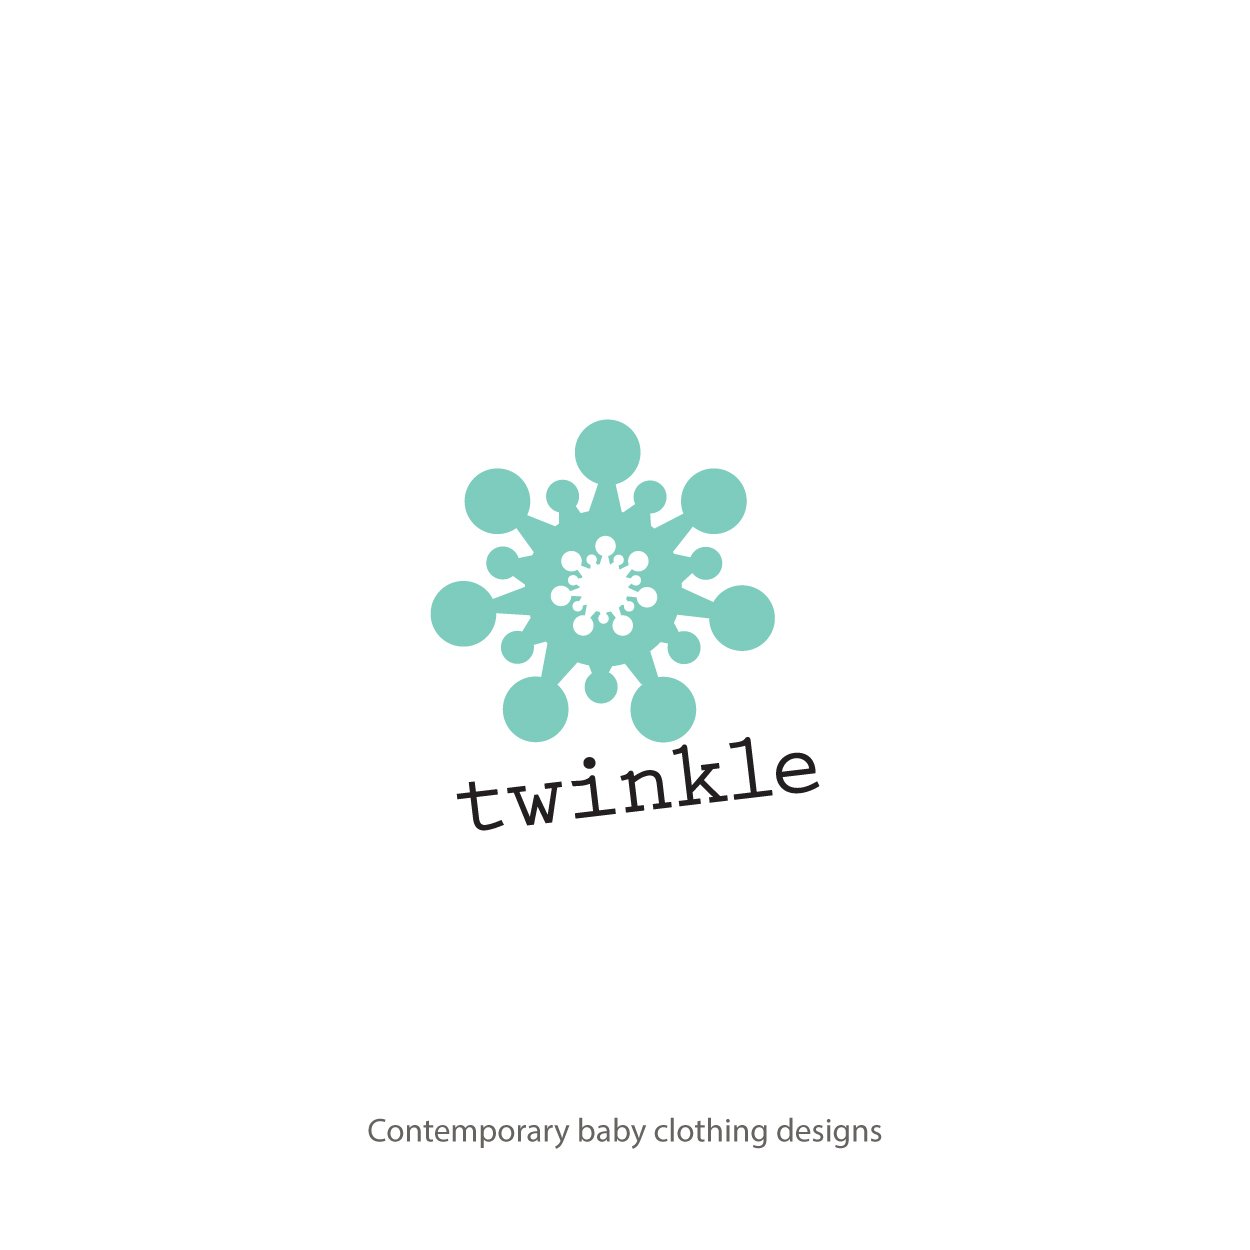 tjungle_design_logos-13.jpg